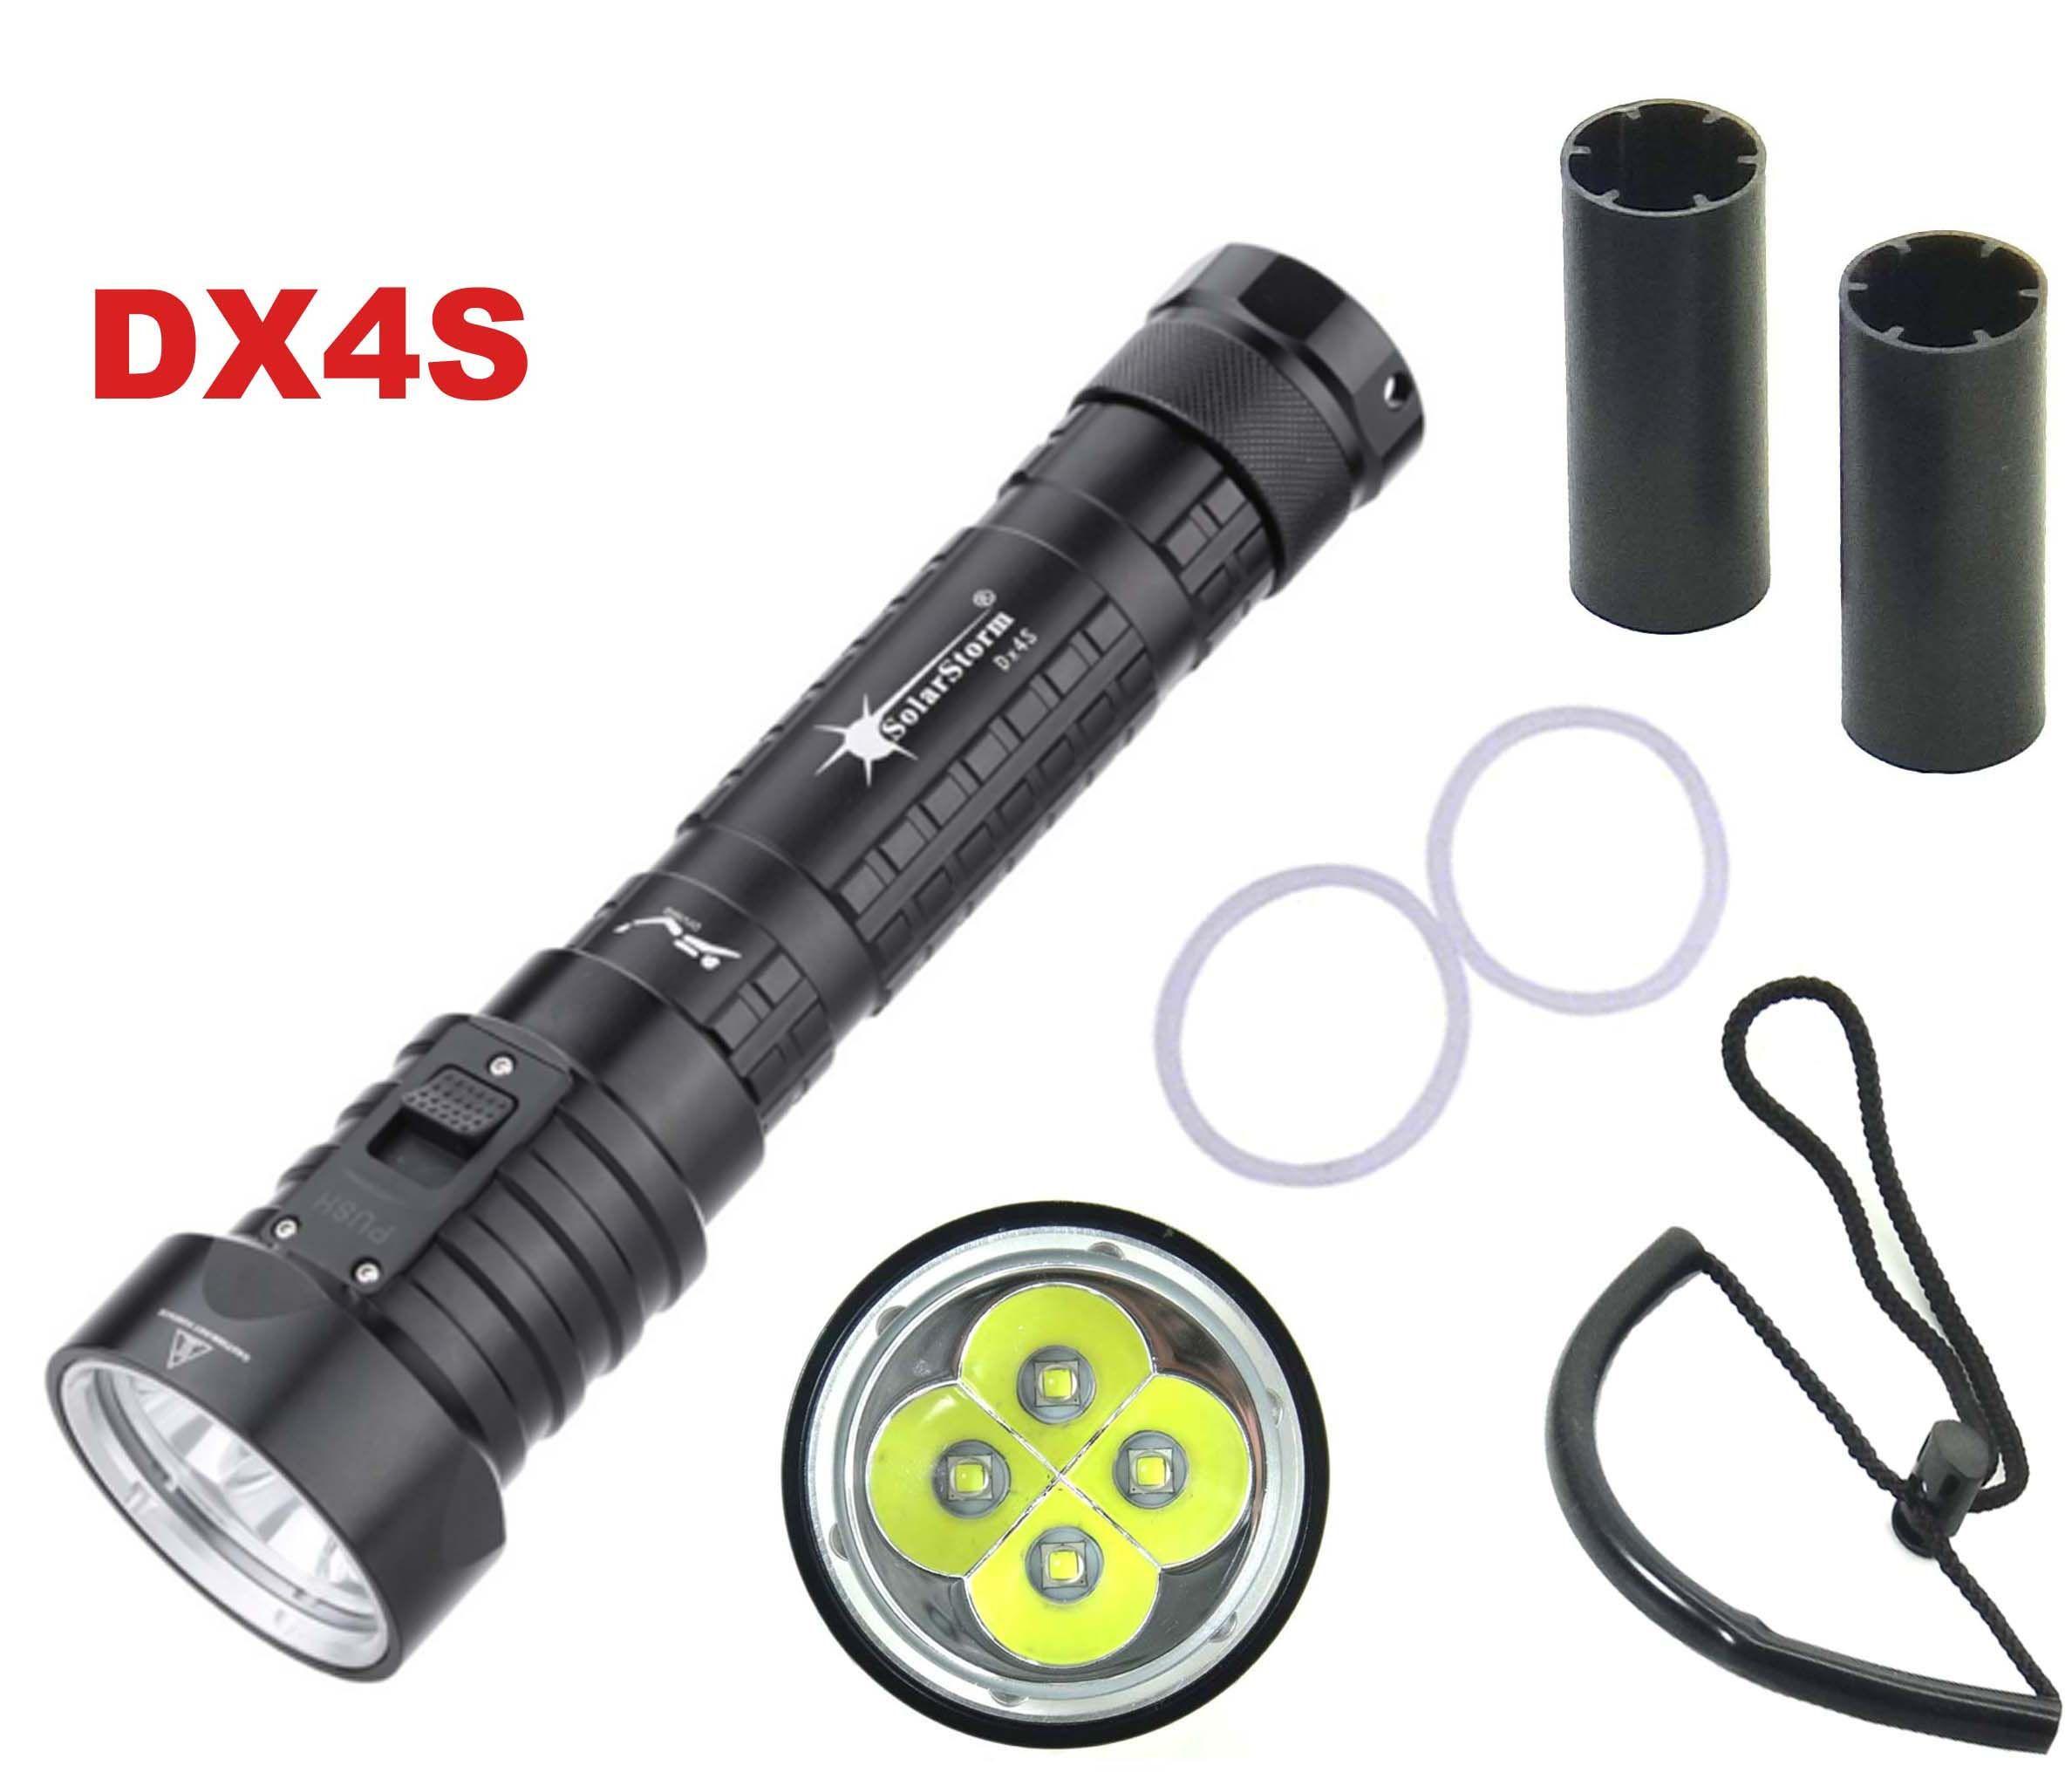 Solarstorm DX4S LED Diving Flashlight 4x CREE L2 4L2 Underwater 18650 26650 Torch Brightness Waterproof 100m Light Led Torch